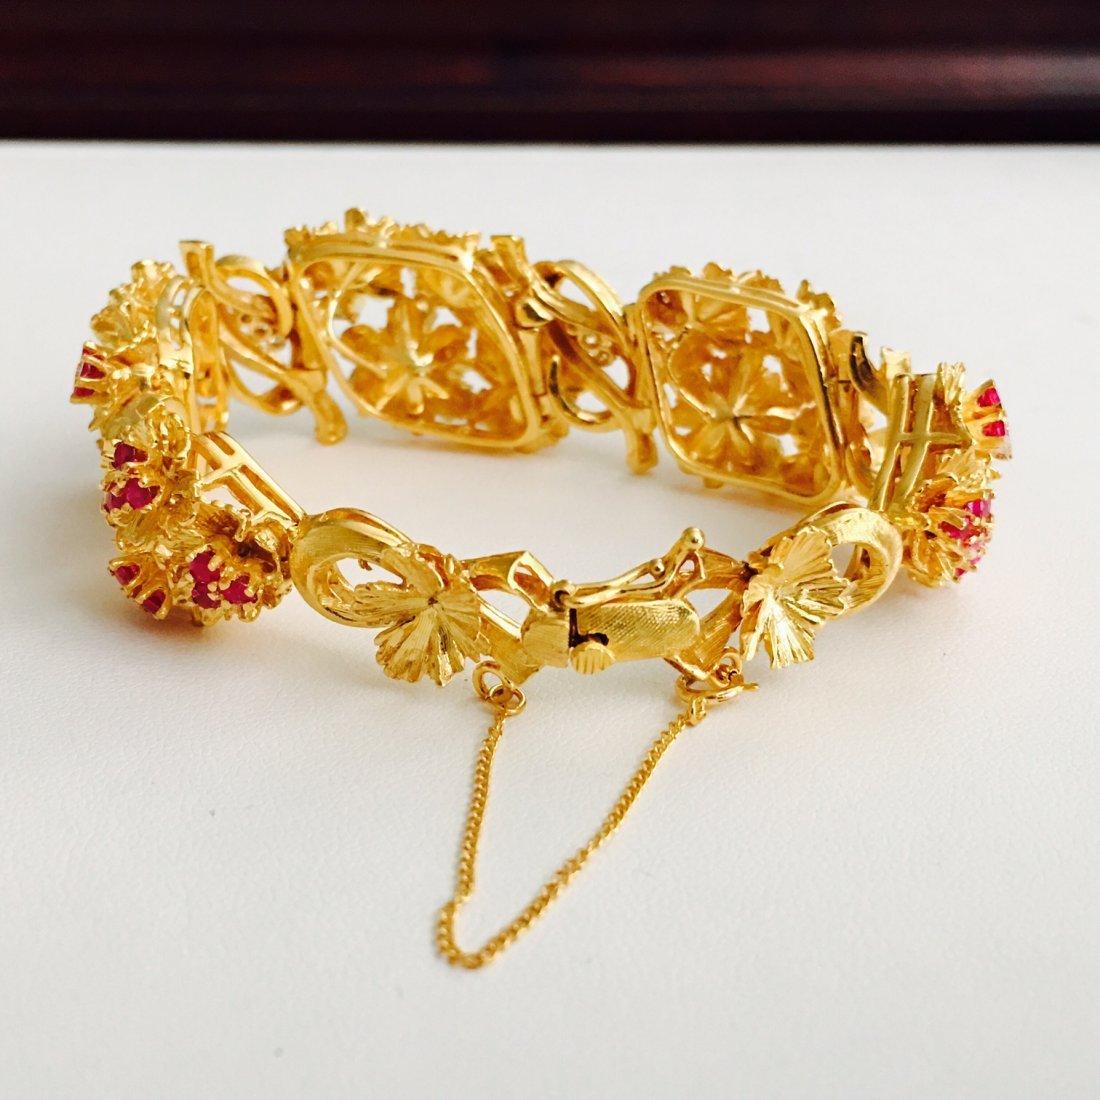 Vinatge 18K Gold 7 CARAT Burma Ruby Diamond Bracelet - 5